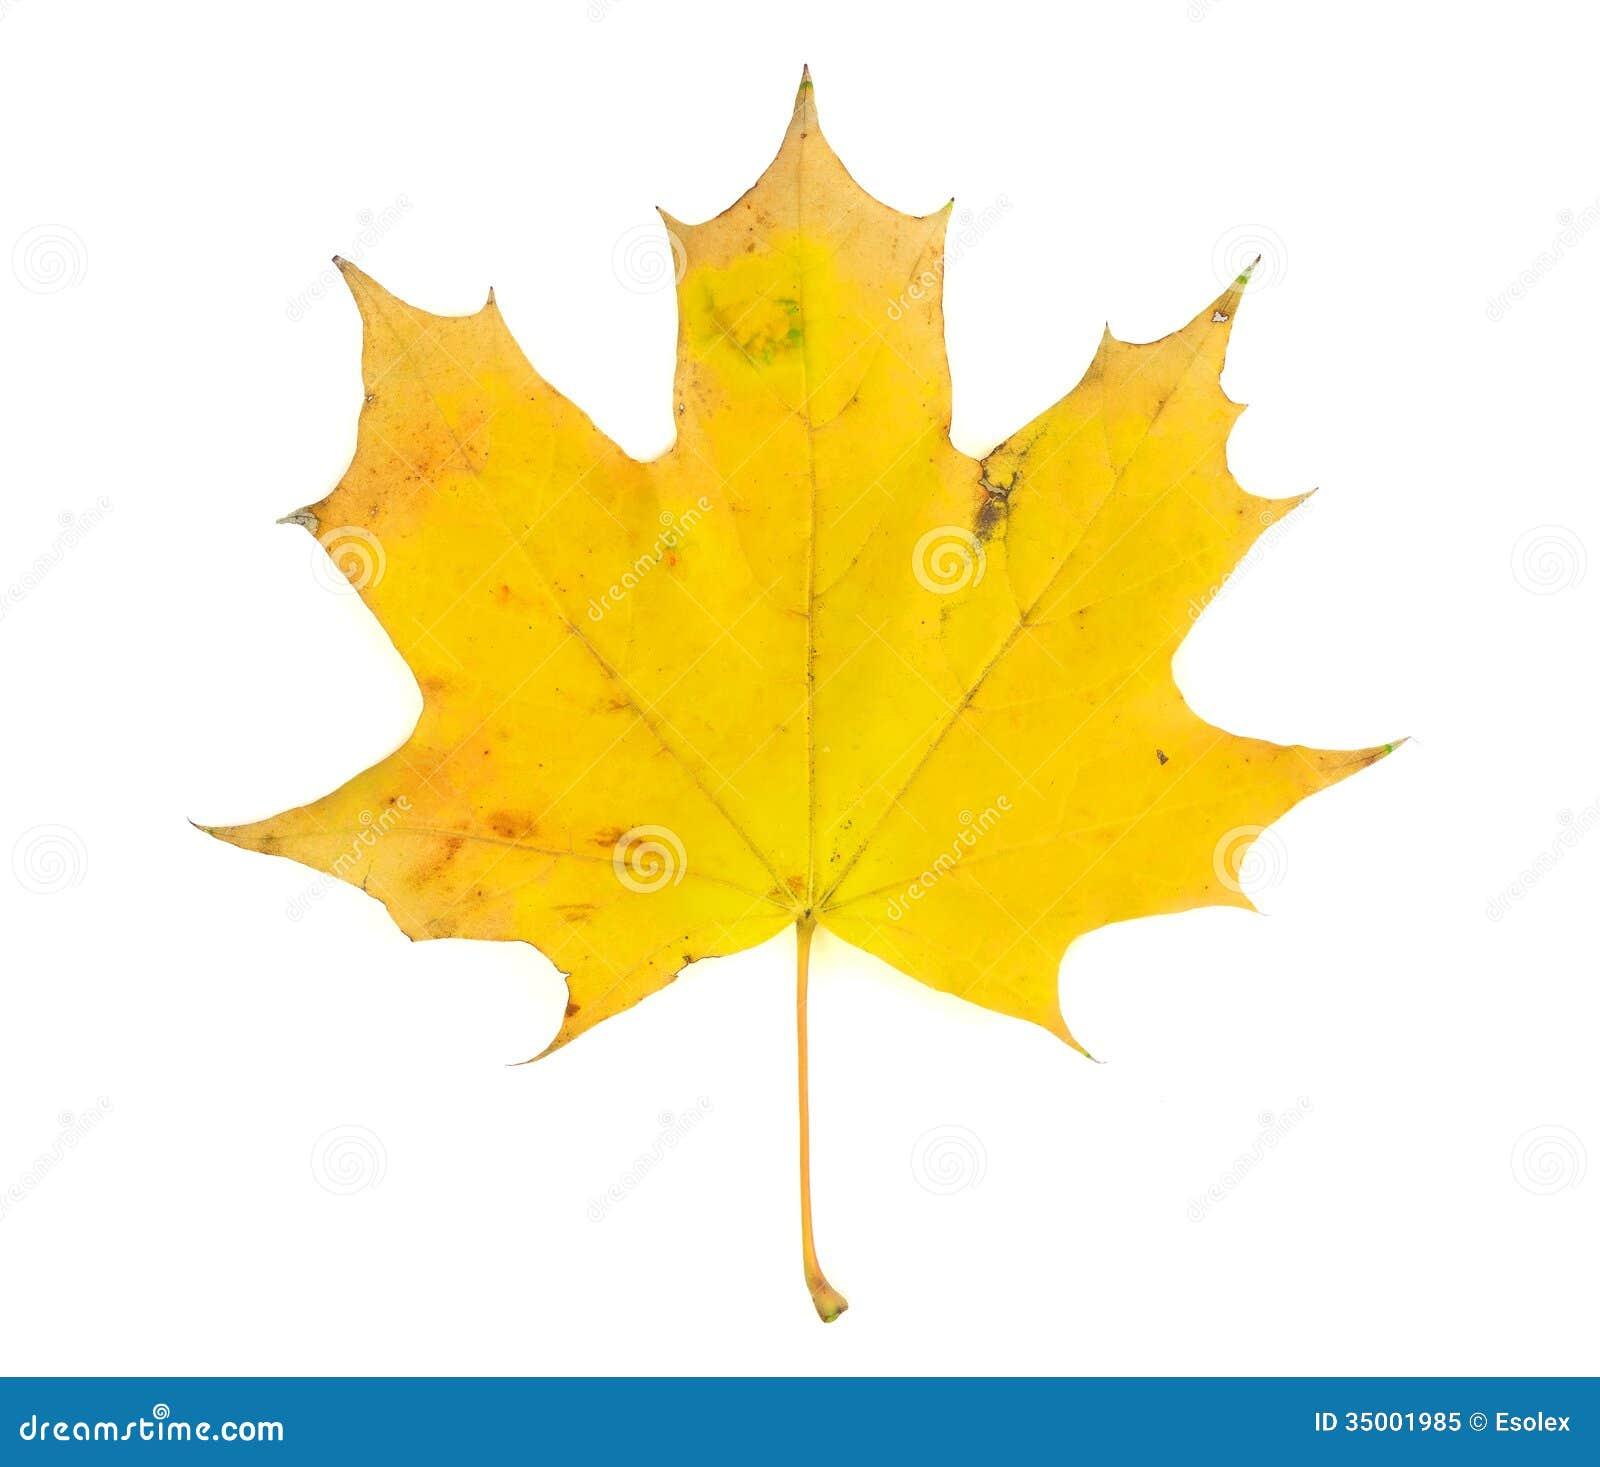 yellow maple leaf royalty free stock photo image 35001985 Waving American Flag Tattoo Animated Waving American Flag